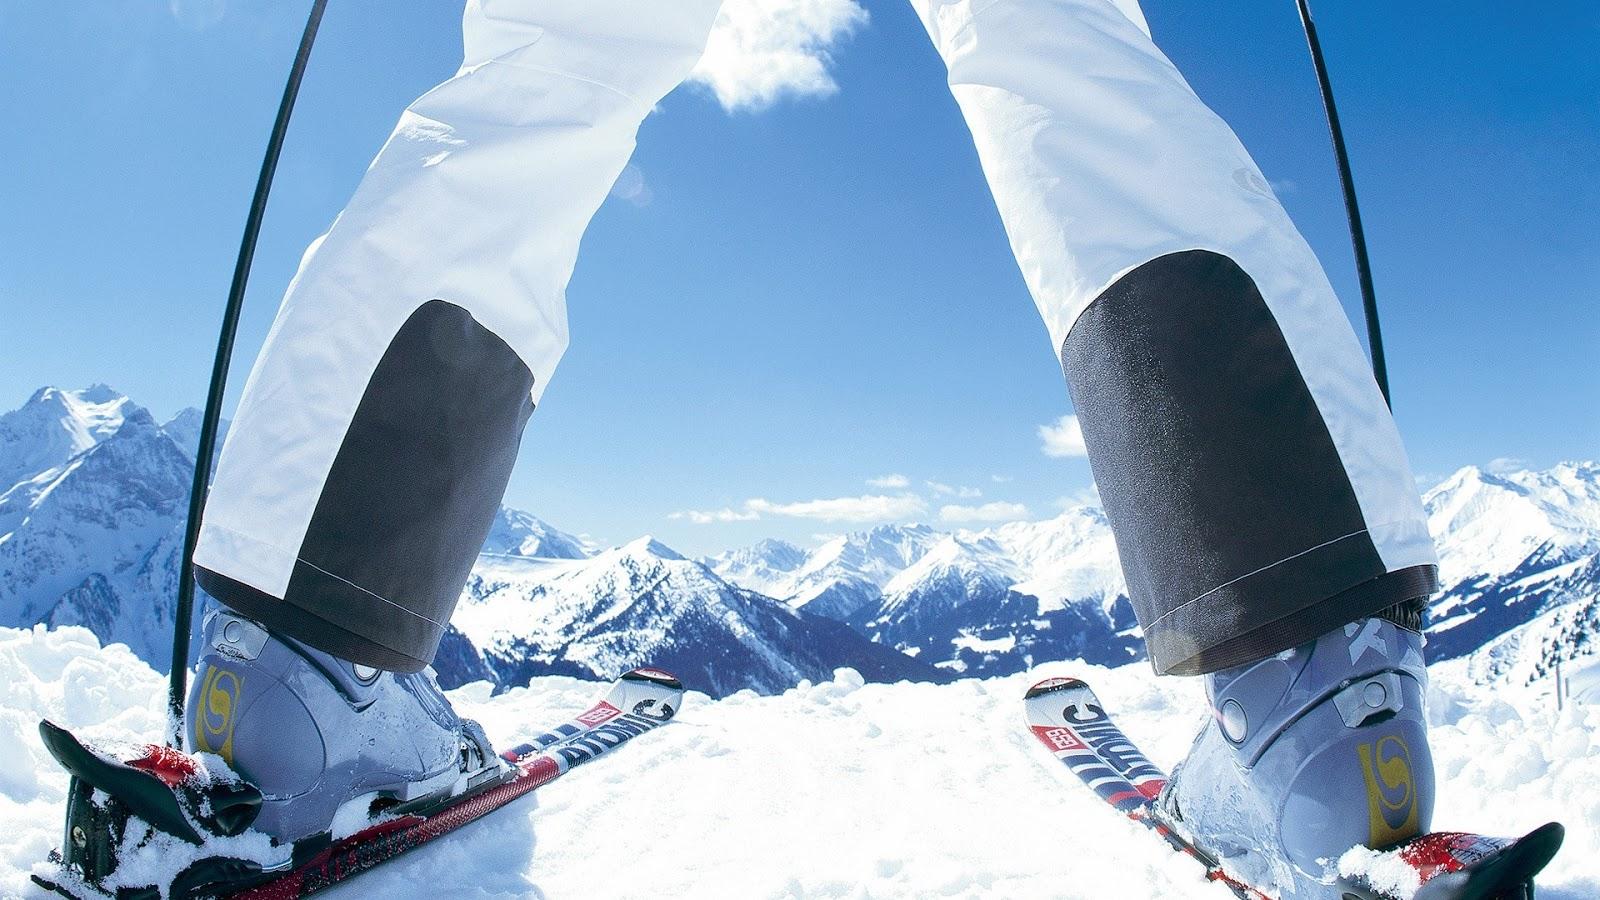 Your Wallpaper Ski